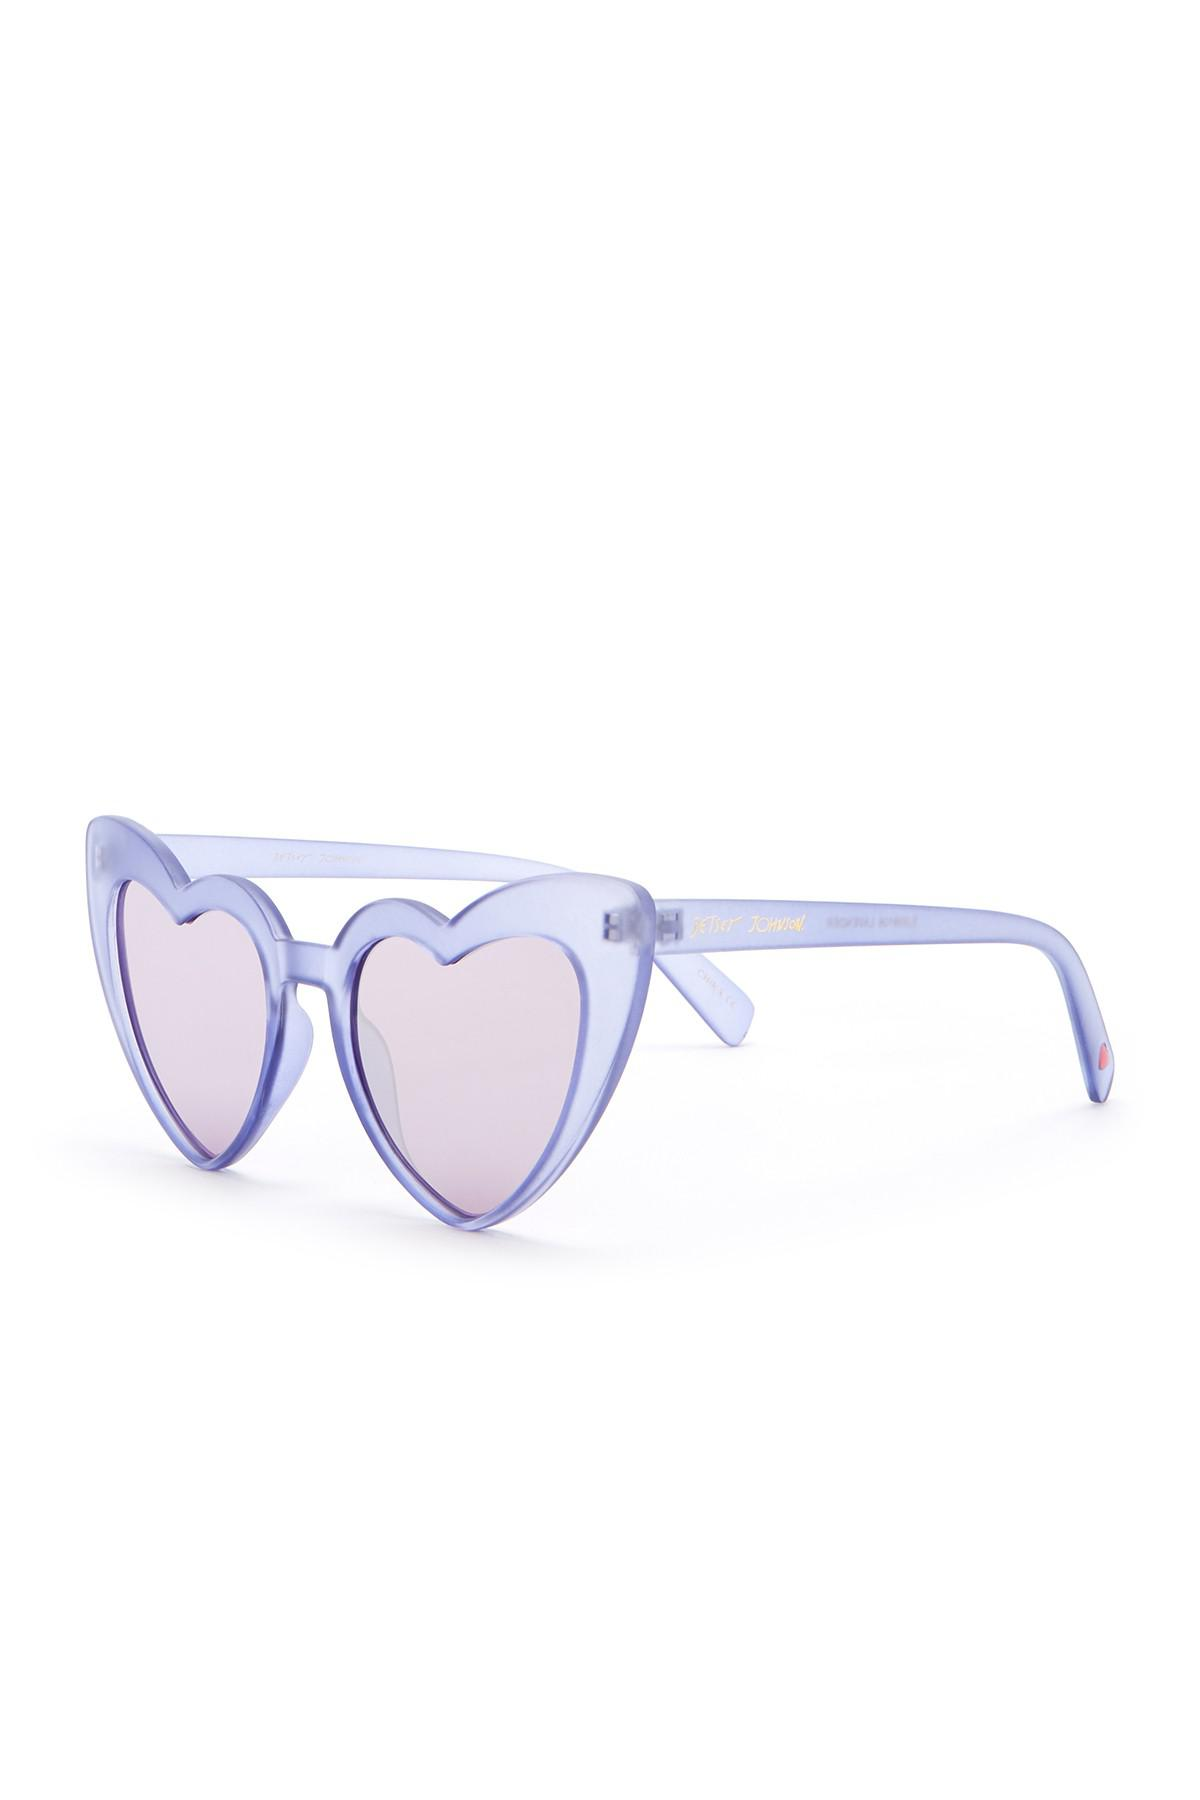 9375063478365 Betsey Johnson 52mm Heart Cat Eye Sunglasses - Lyst